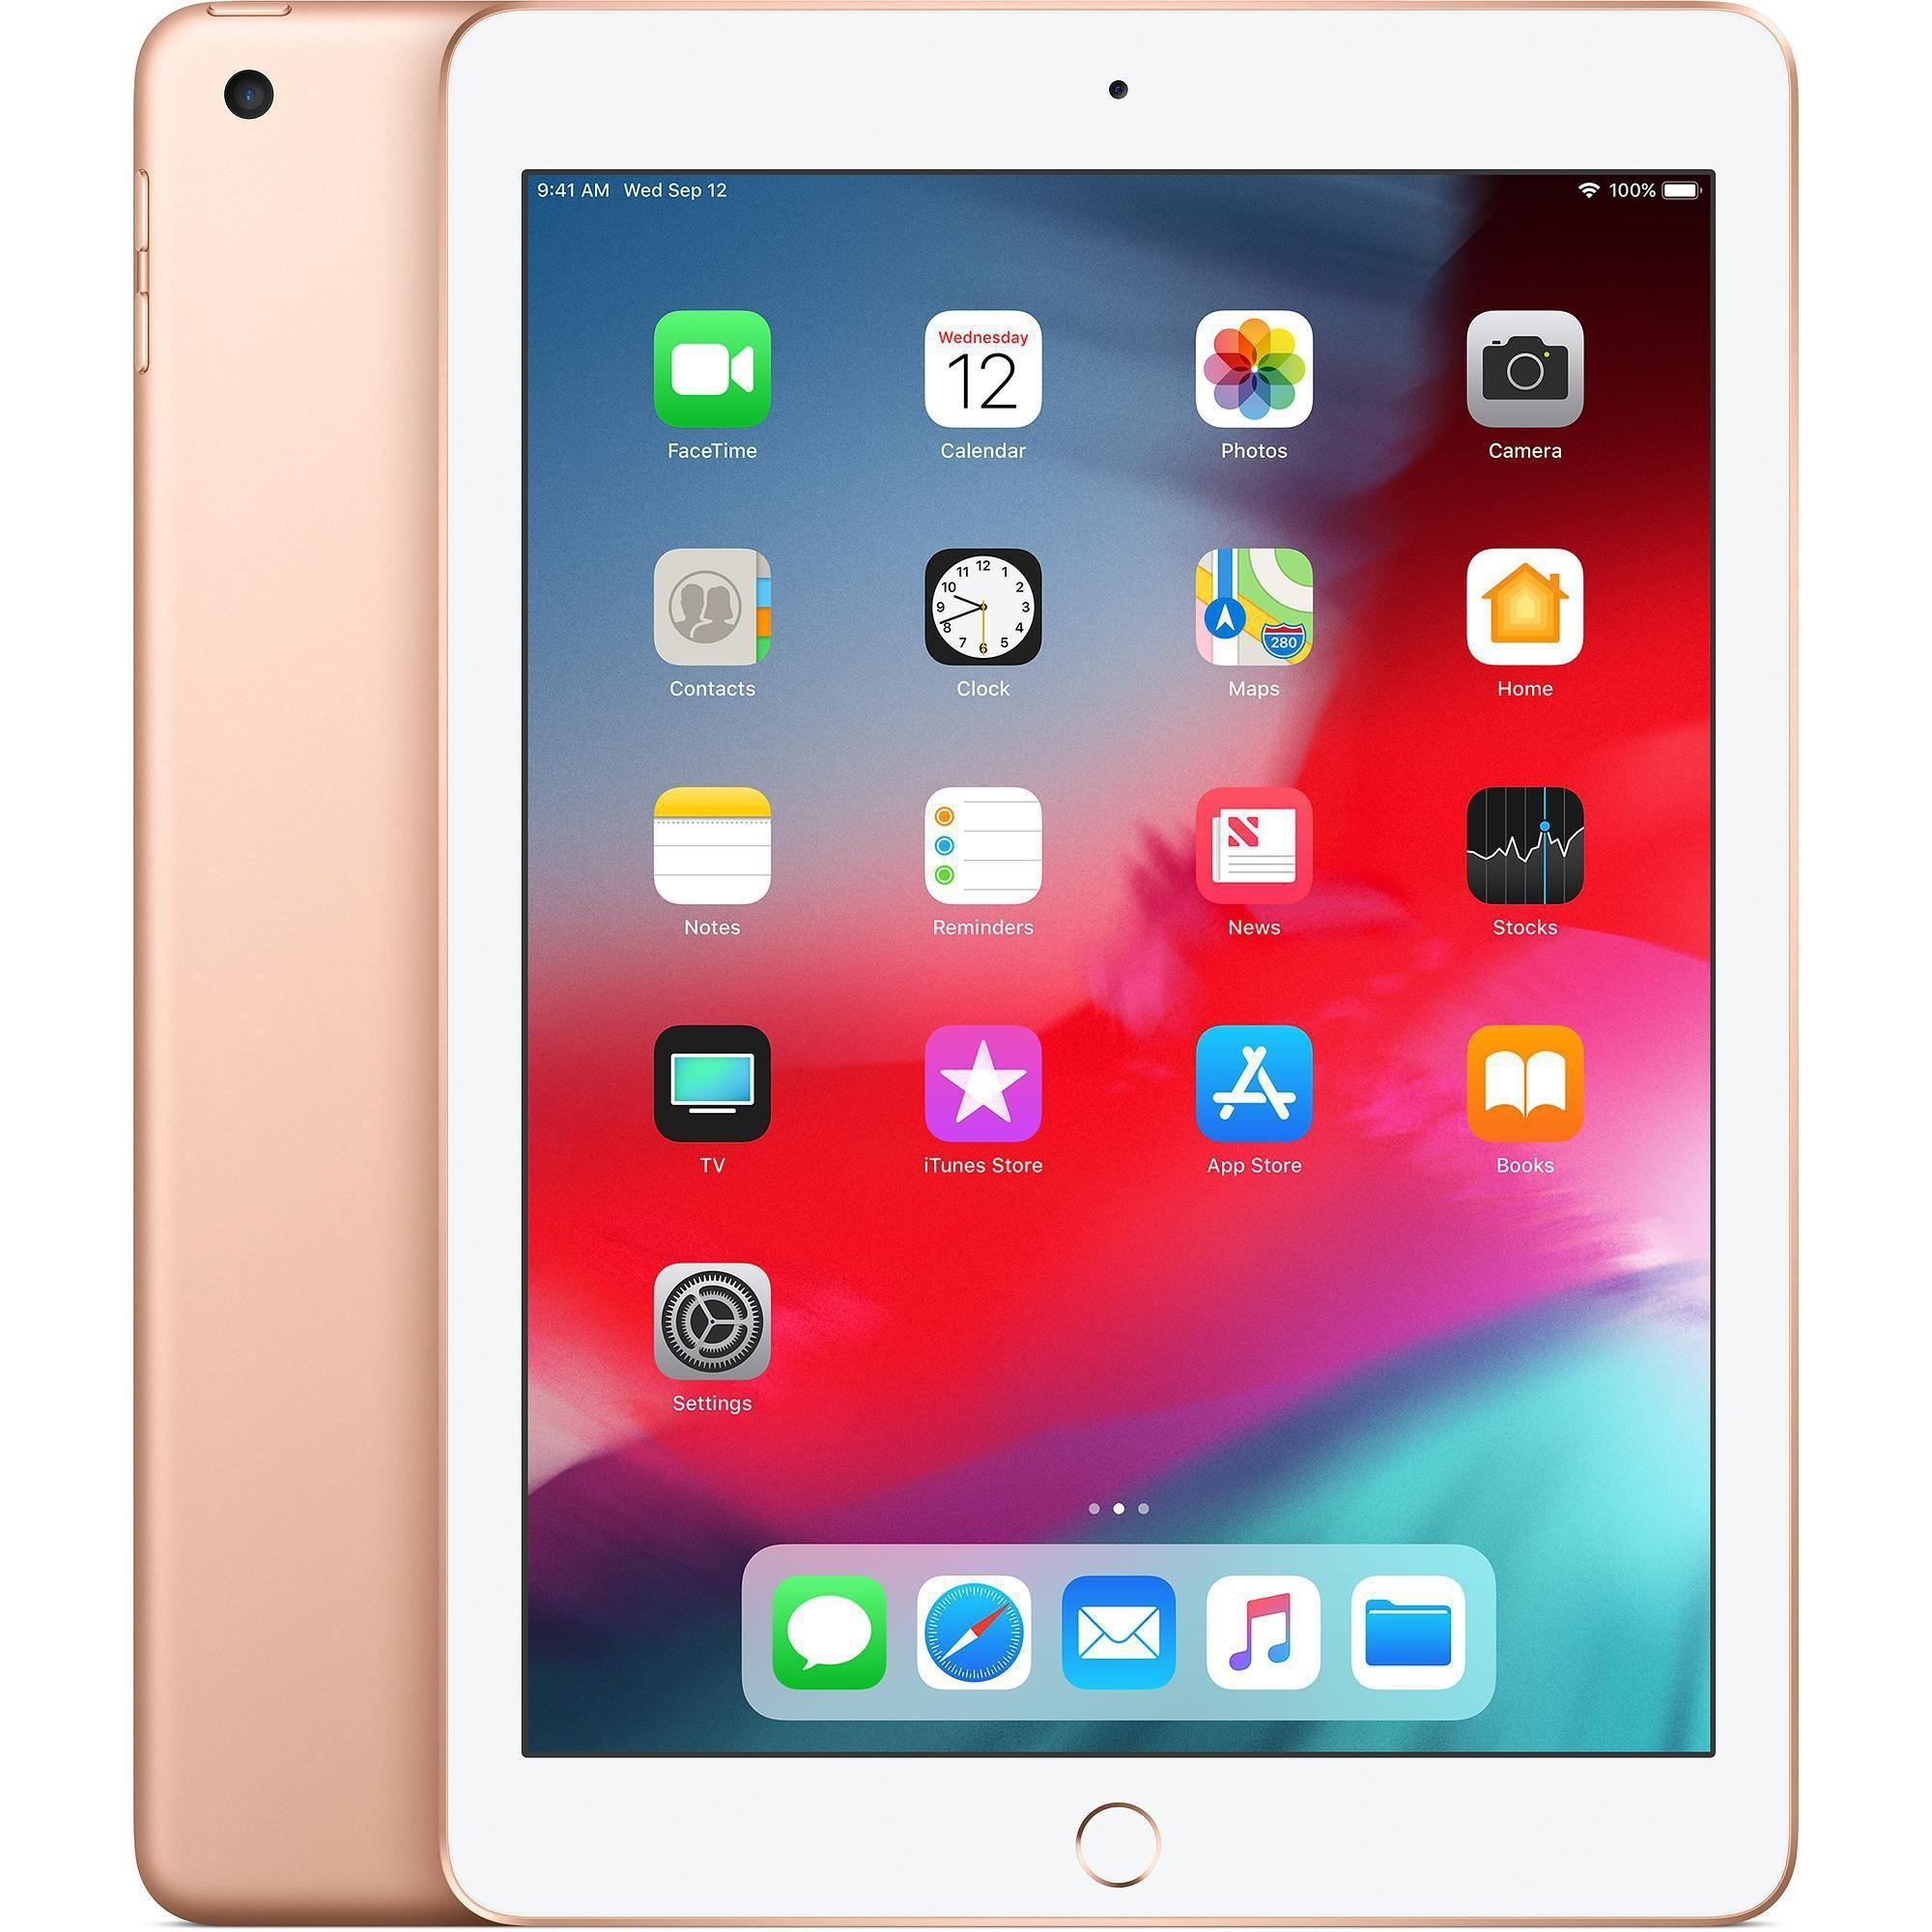 Ipad 9 7 Inch 6th Gen March 2018 128gb Gold Wi Fi Apple Ipad New Apple Ipad Refurbished Ipad